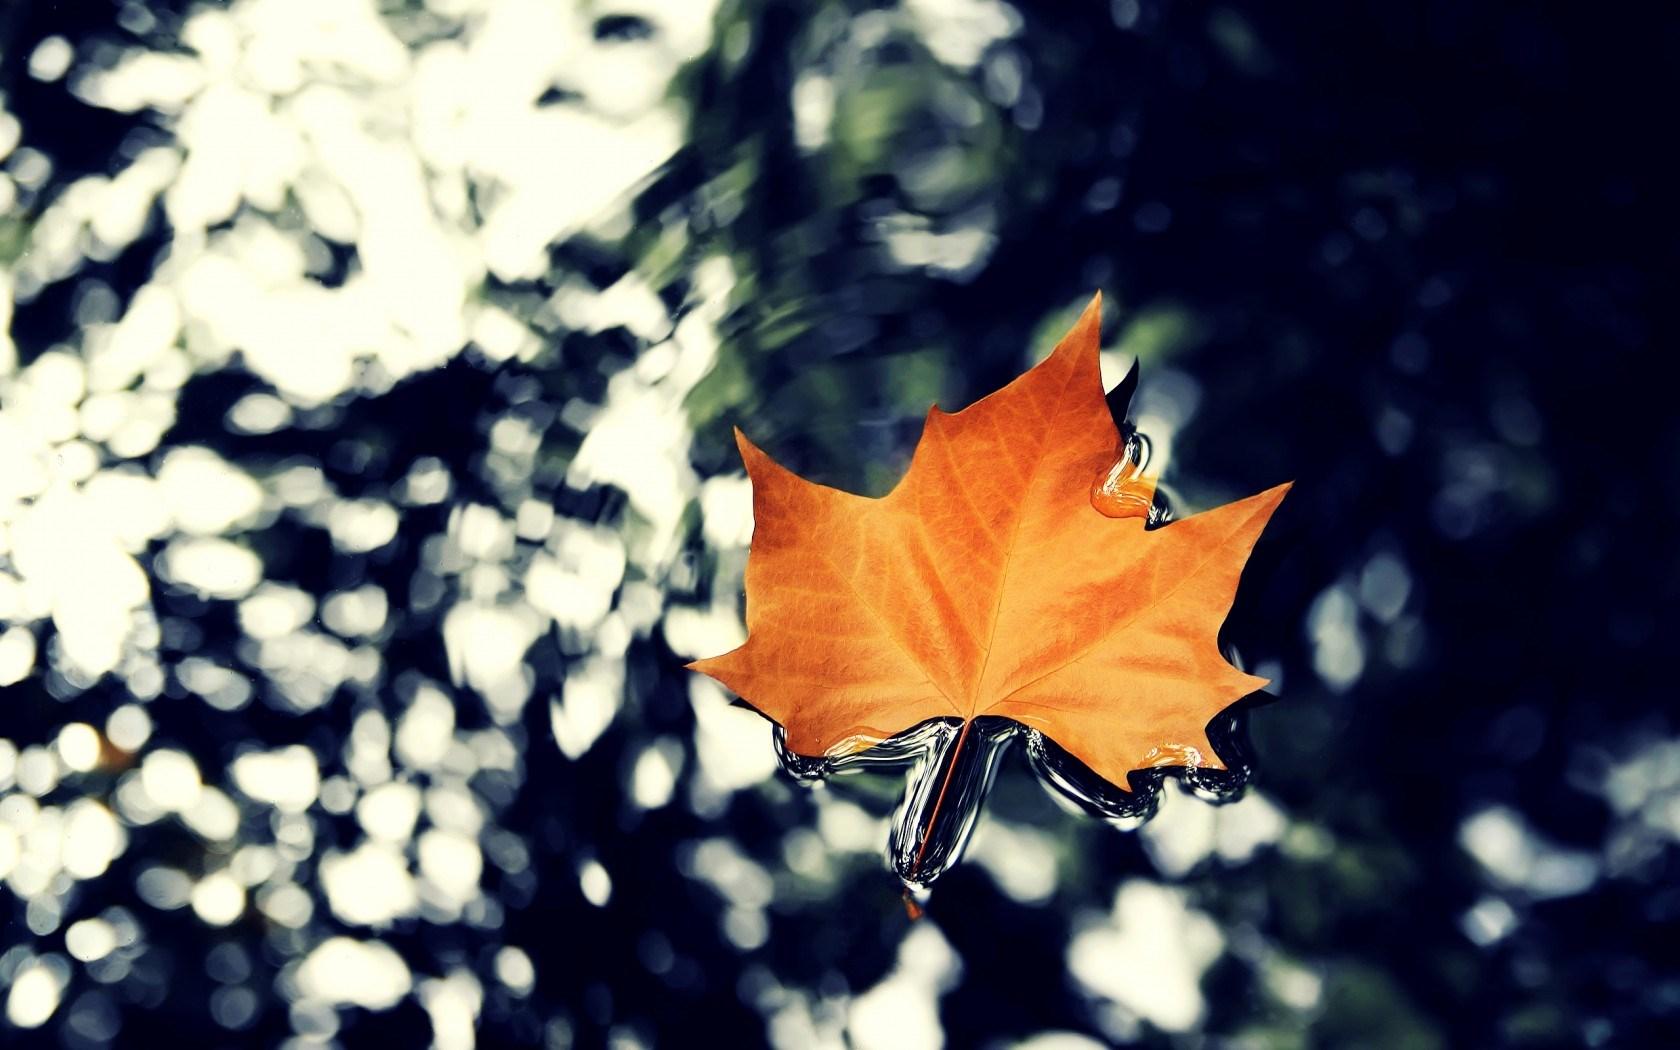 Water Falling Live Wallpaper Download Autumn Leaf Nature Stunning Hd Desktop Wallpapers 4k Hd